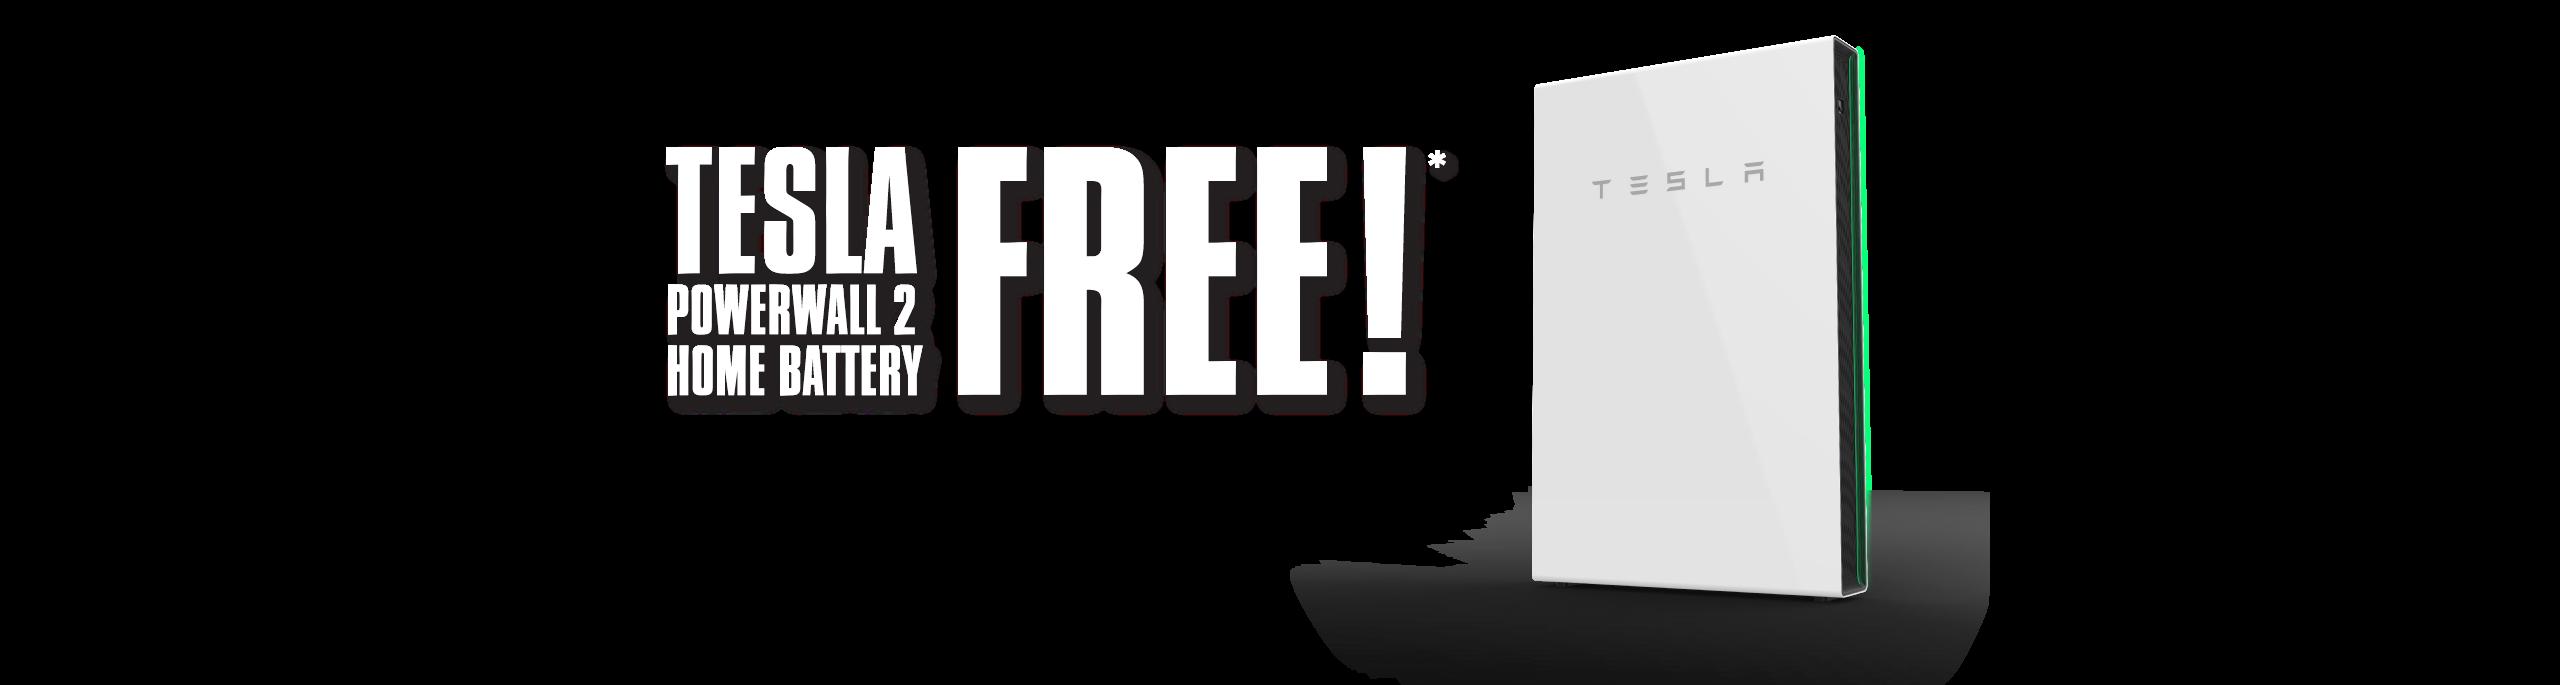 TESLA-2018_Web-Page-TEXT-1 Free Tesla Powerwall Promotion